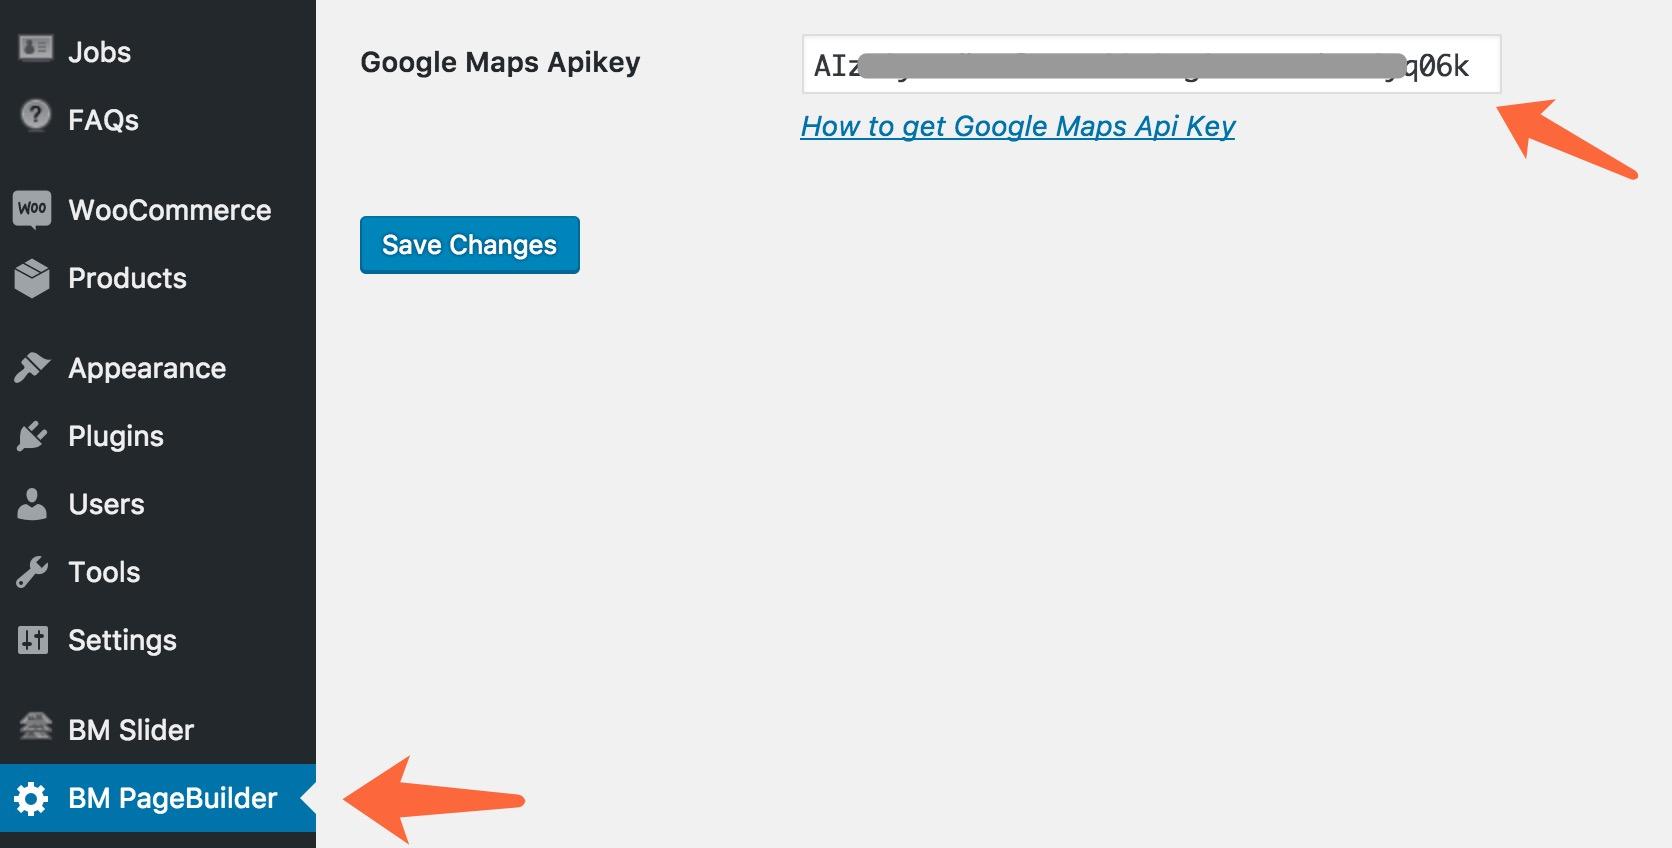 Gooelg_maps_ApiKey